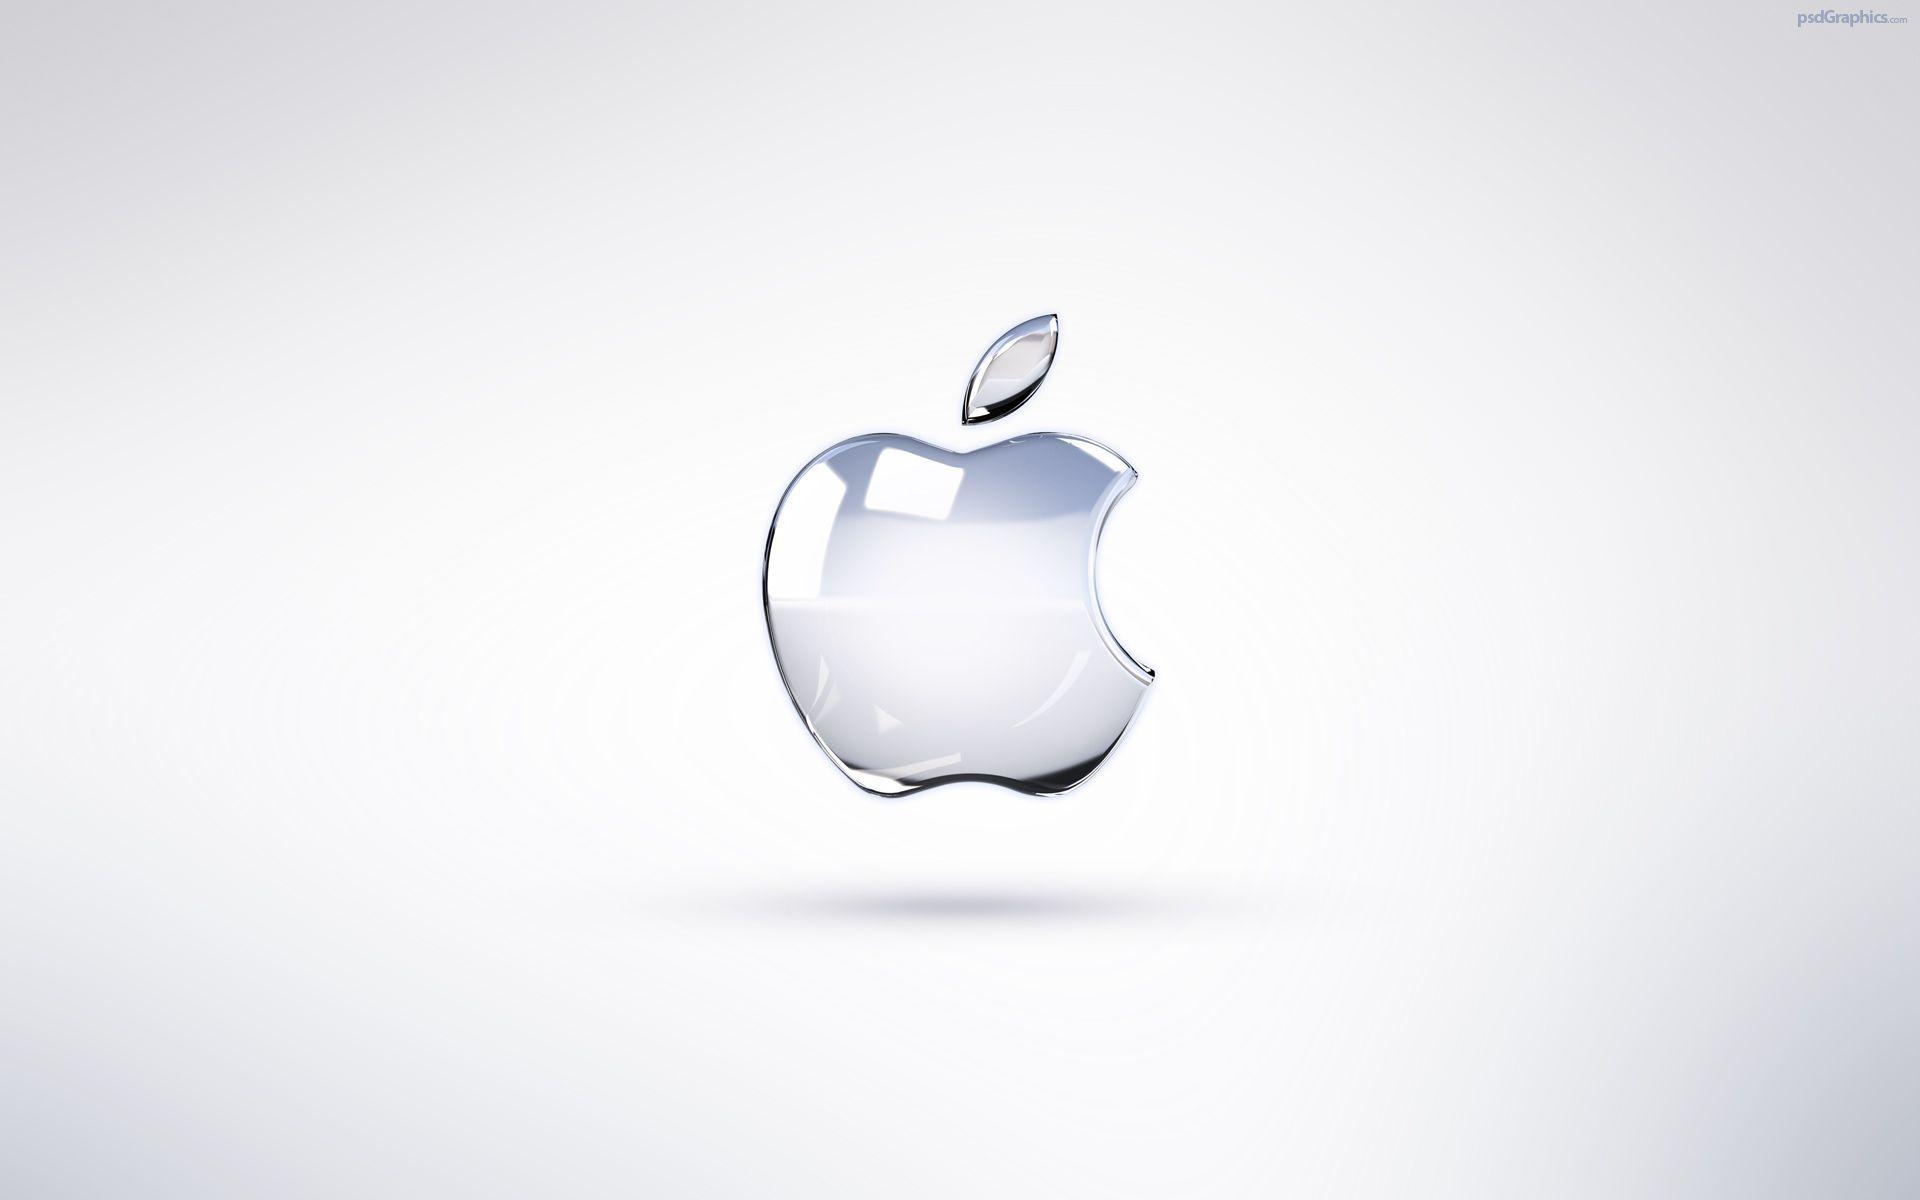 Hd wallpaper macbook - Hd Wallpapers Apple Icon Wallpaper Iphone Ss